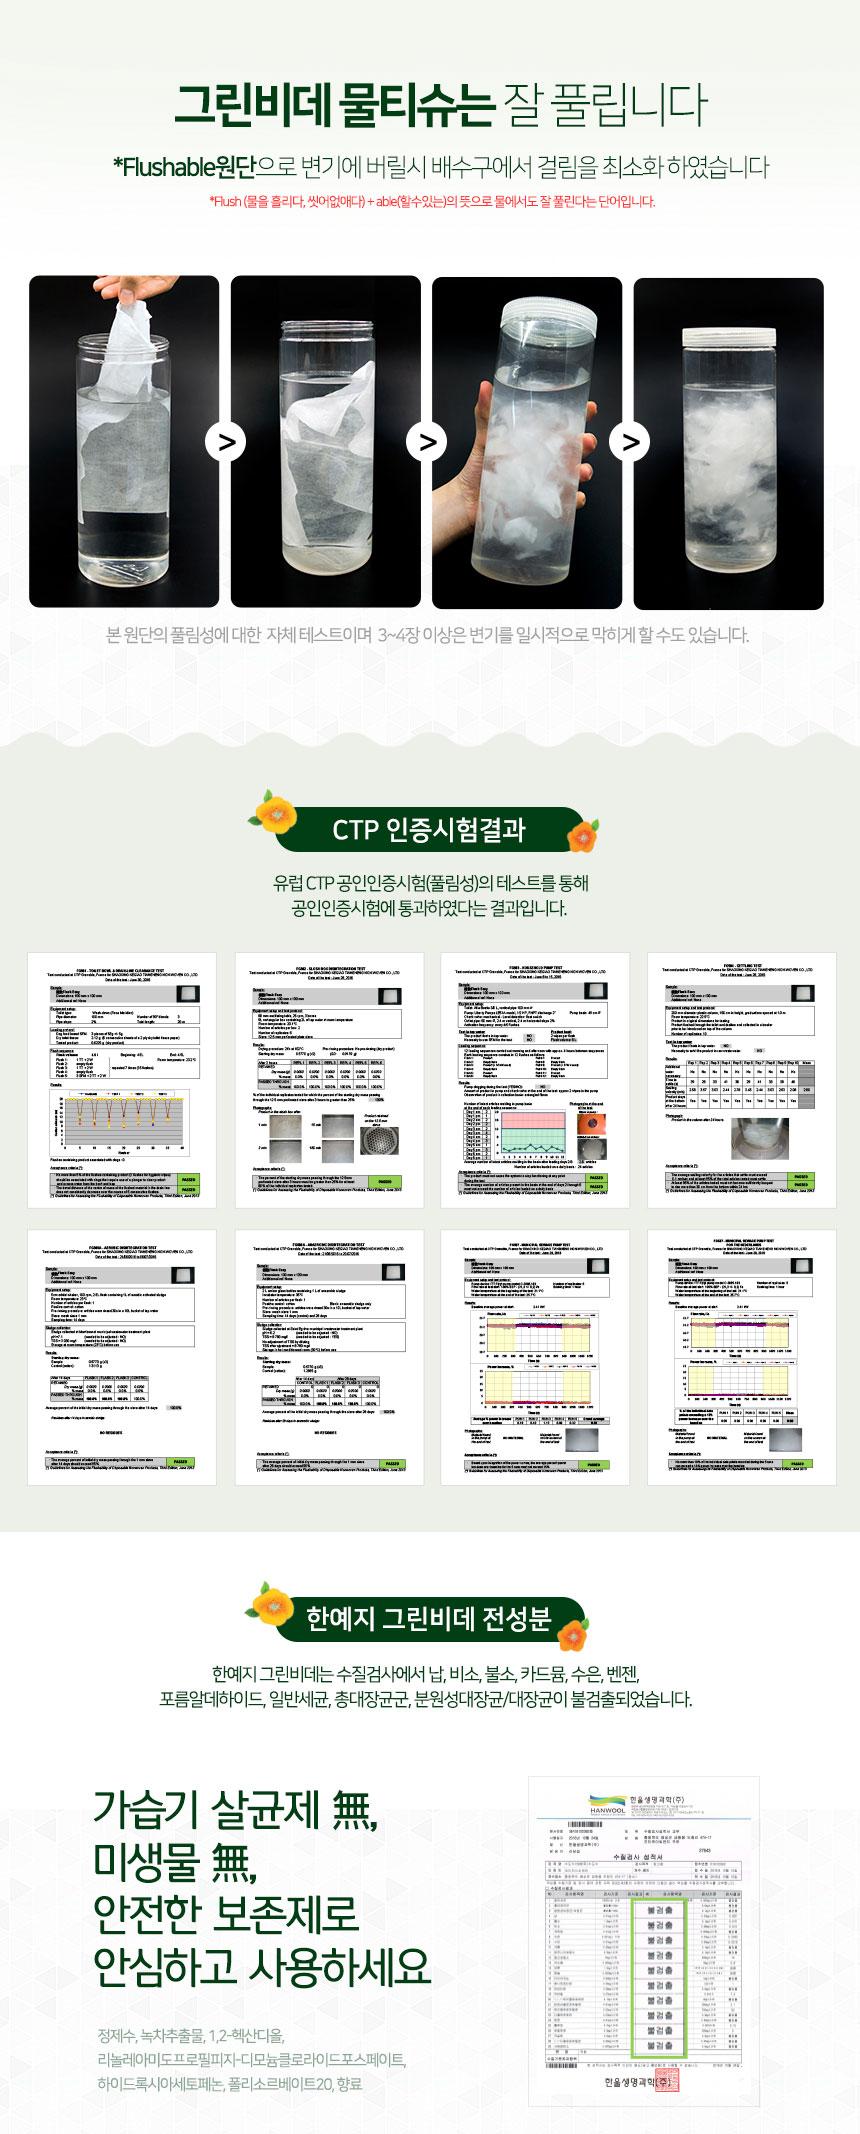 20170426_han_wt2_page_04.jpg